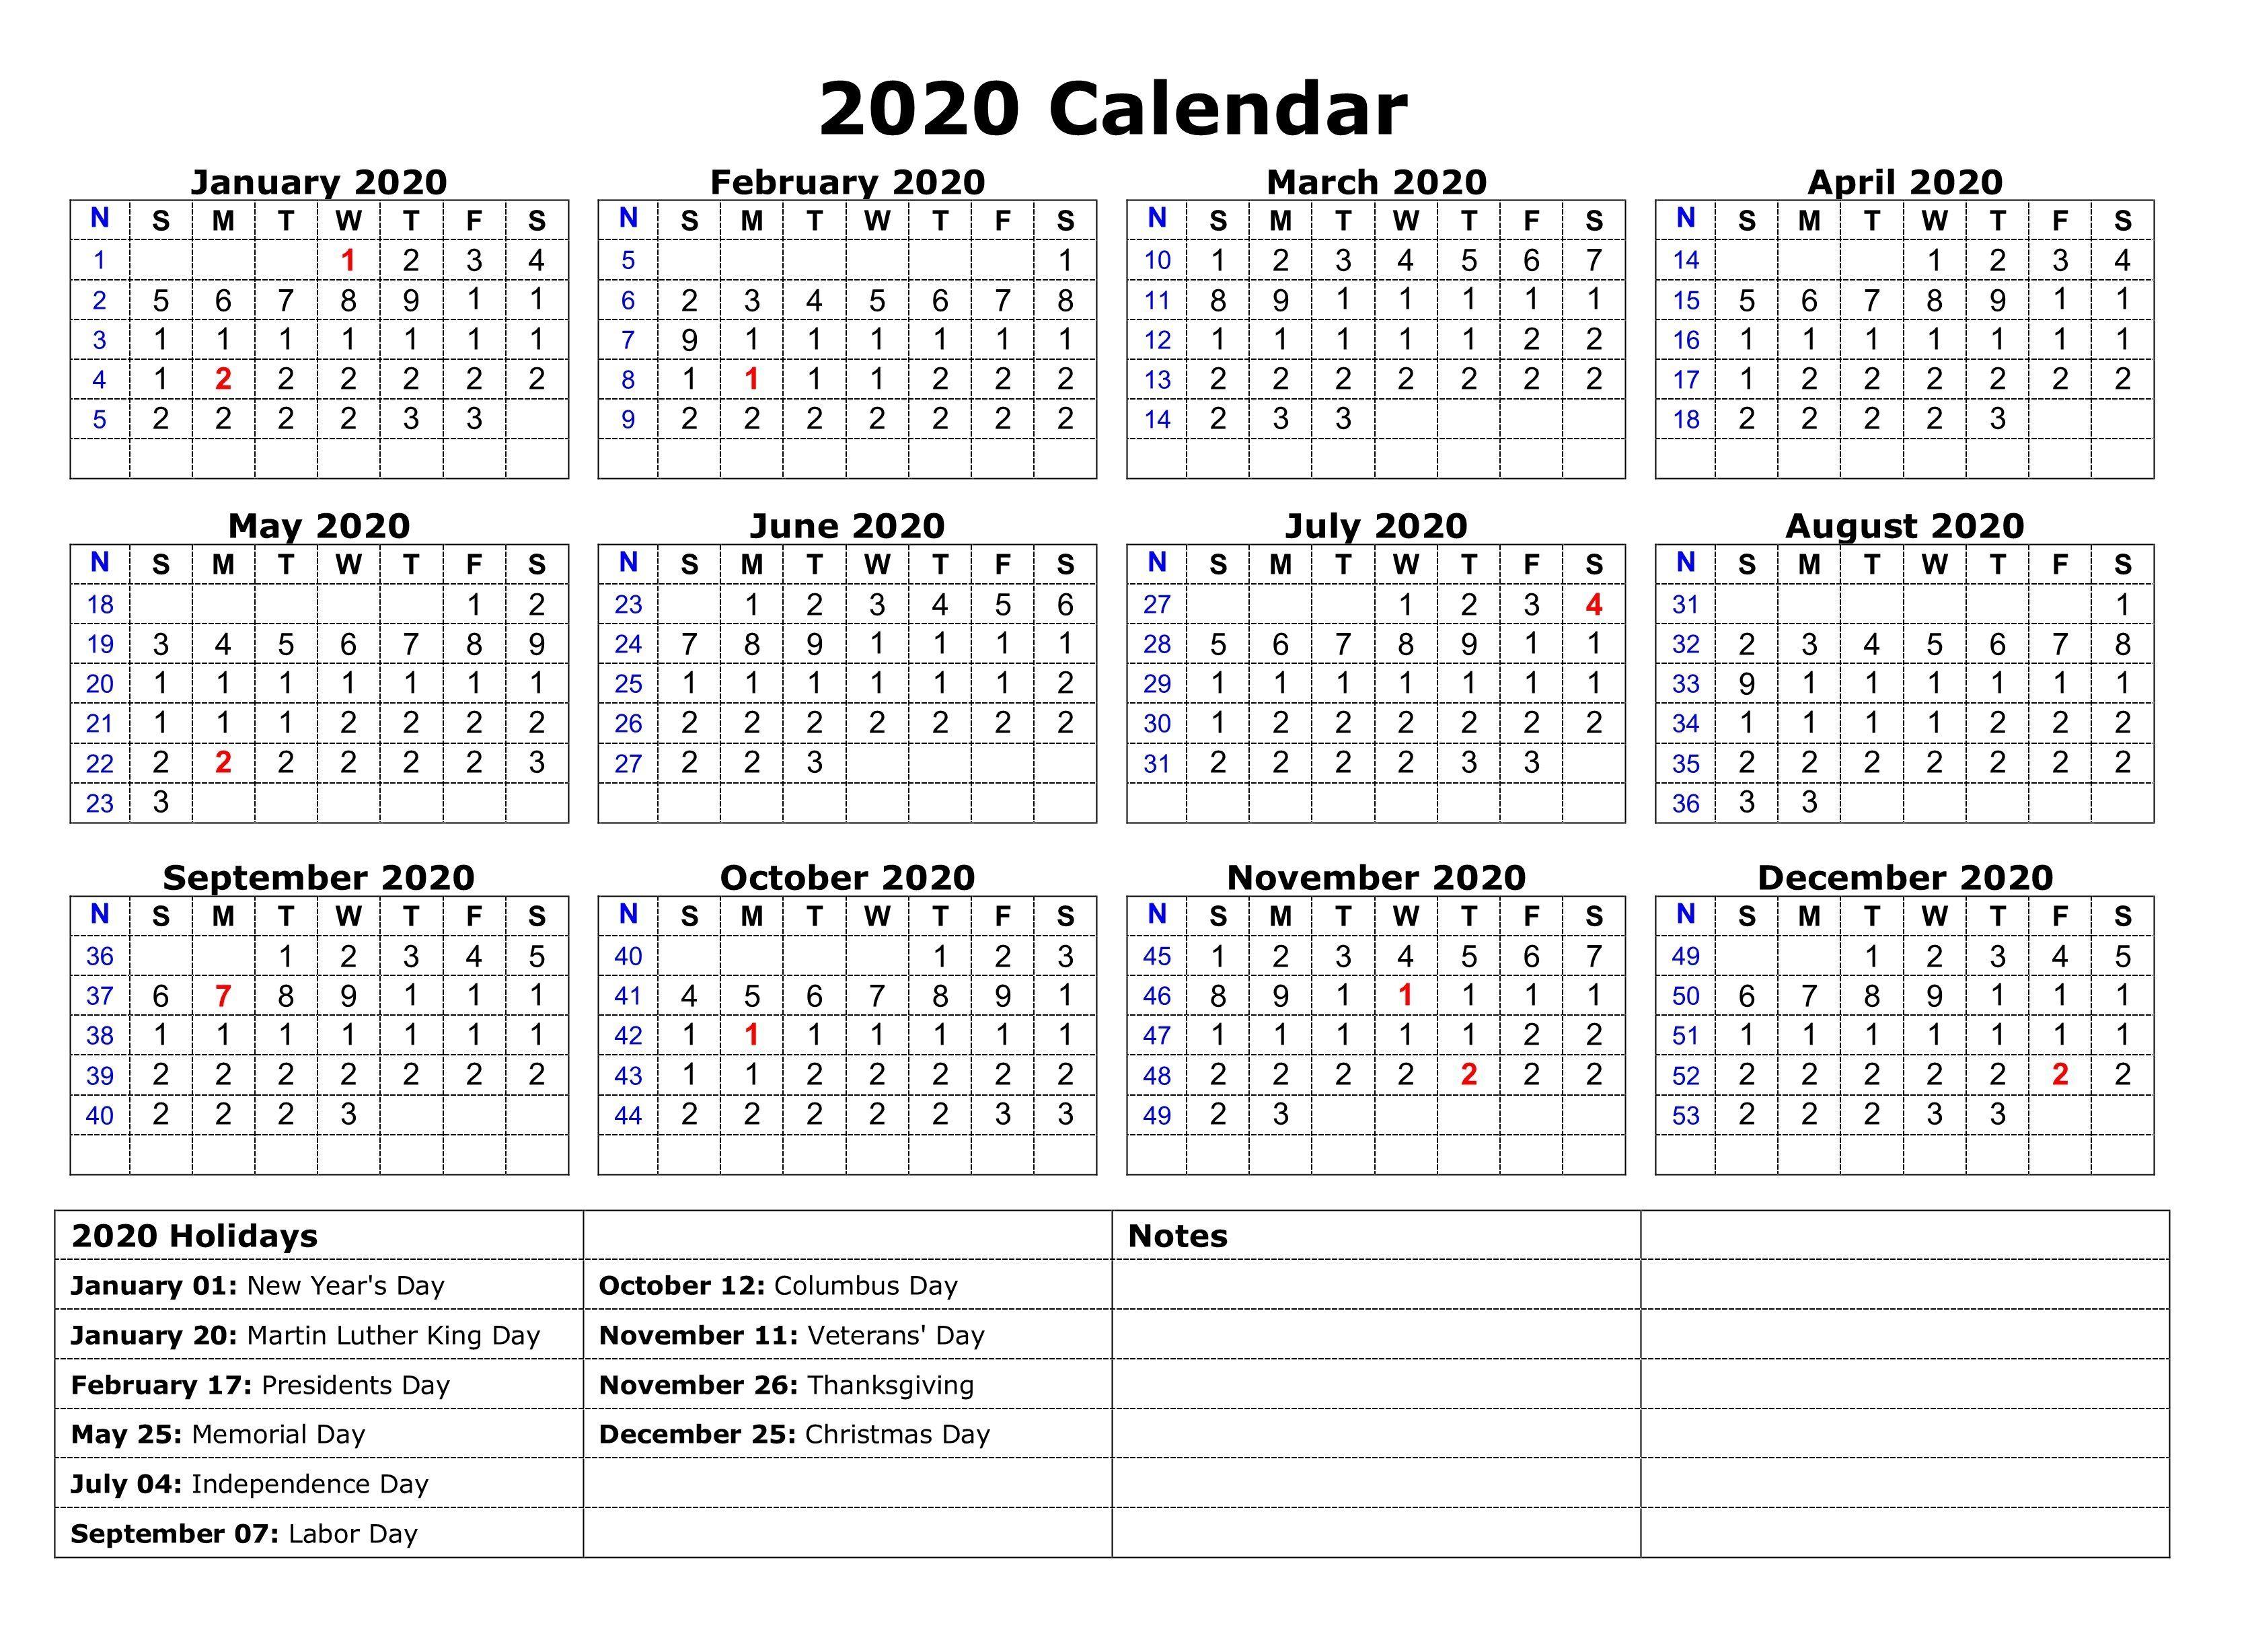 Printable 2020 One Page Holidays Calendar | November with 2020 Calendar With Holidays